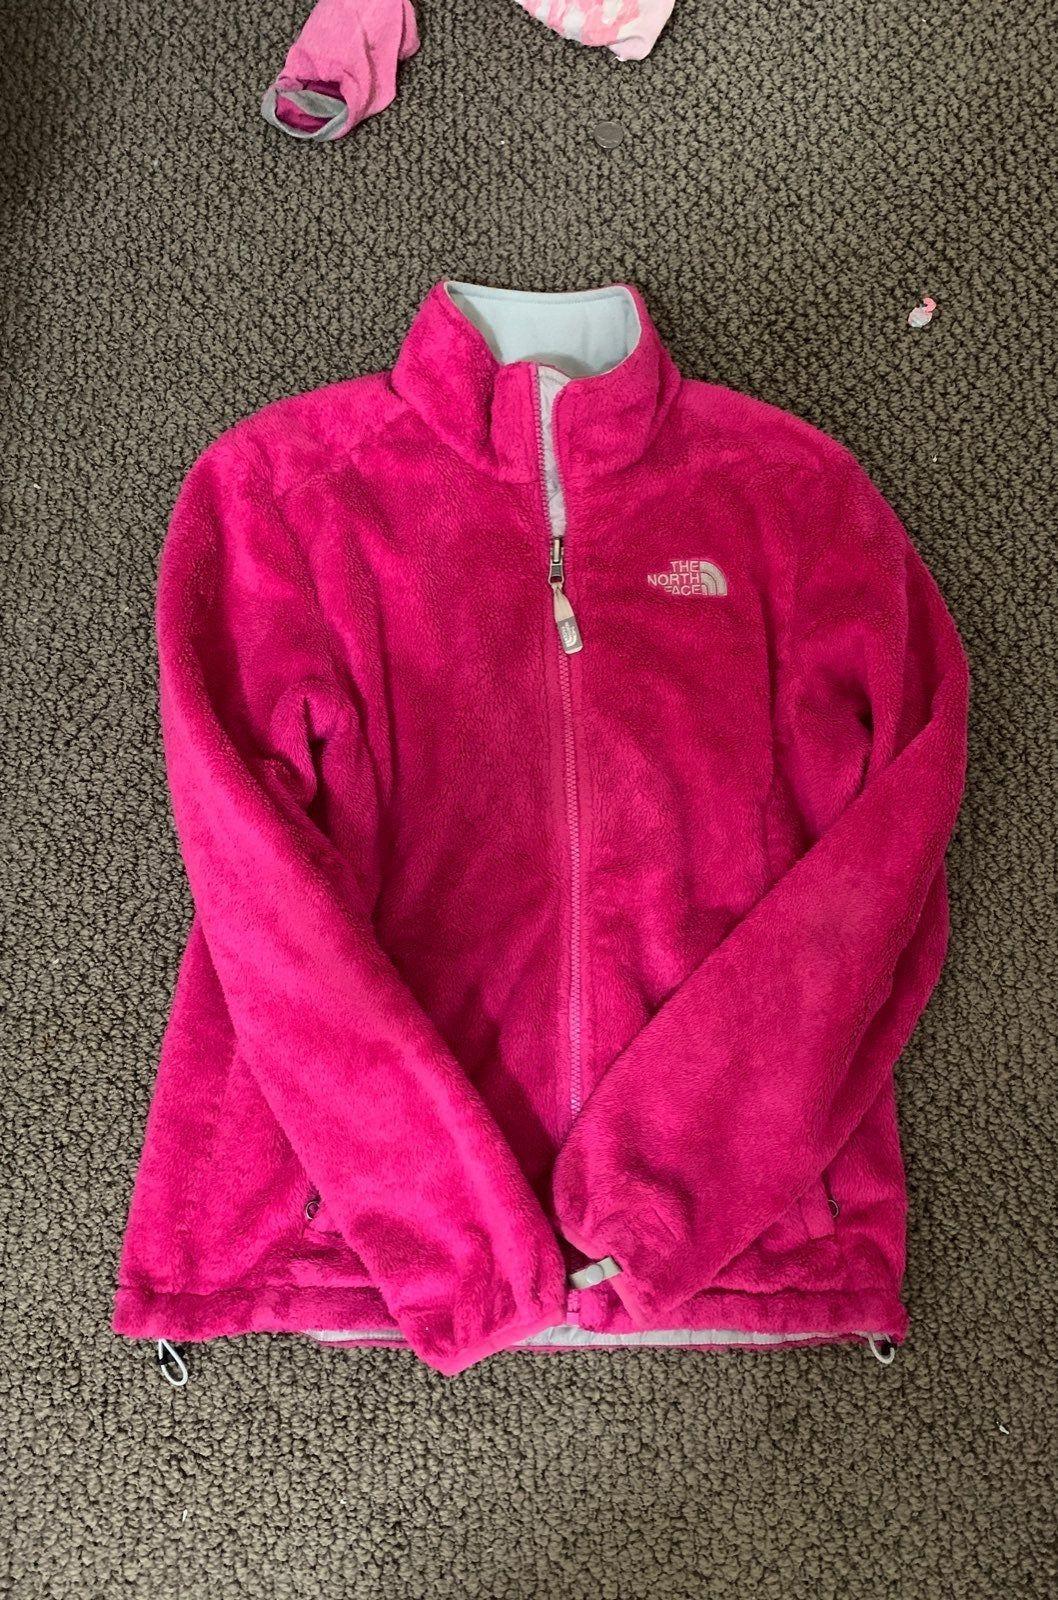 Hot Pink North Face Jacket Size Medium So Fuzzy Cute On North Face Coat Pink North Face Jacket Jackets [ 1600 x 1058 Pixel ]